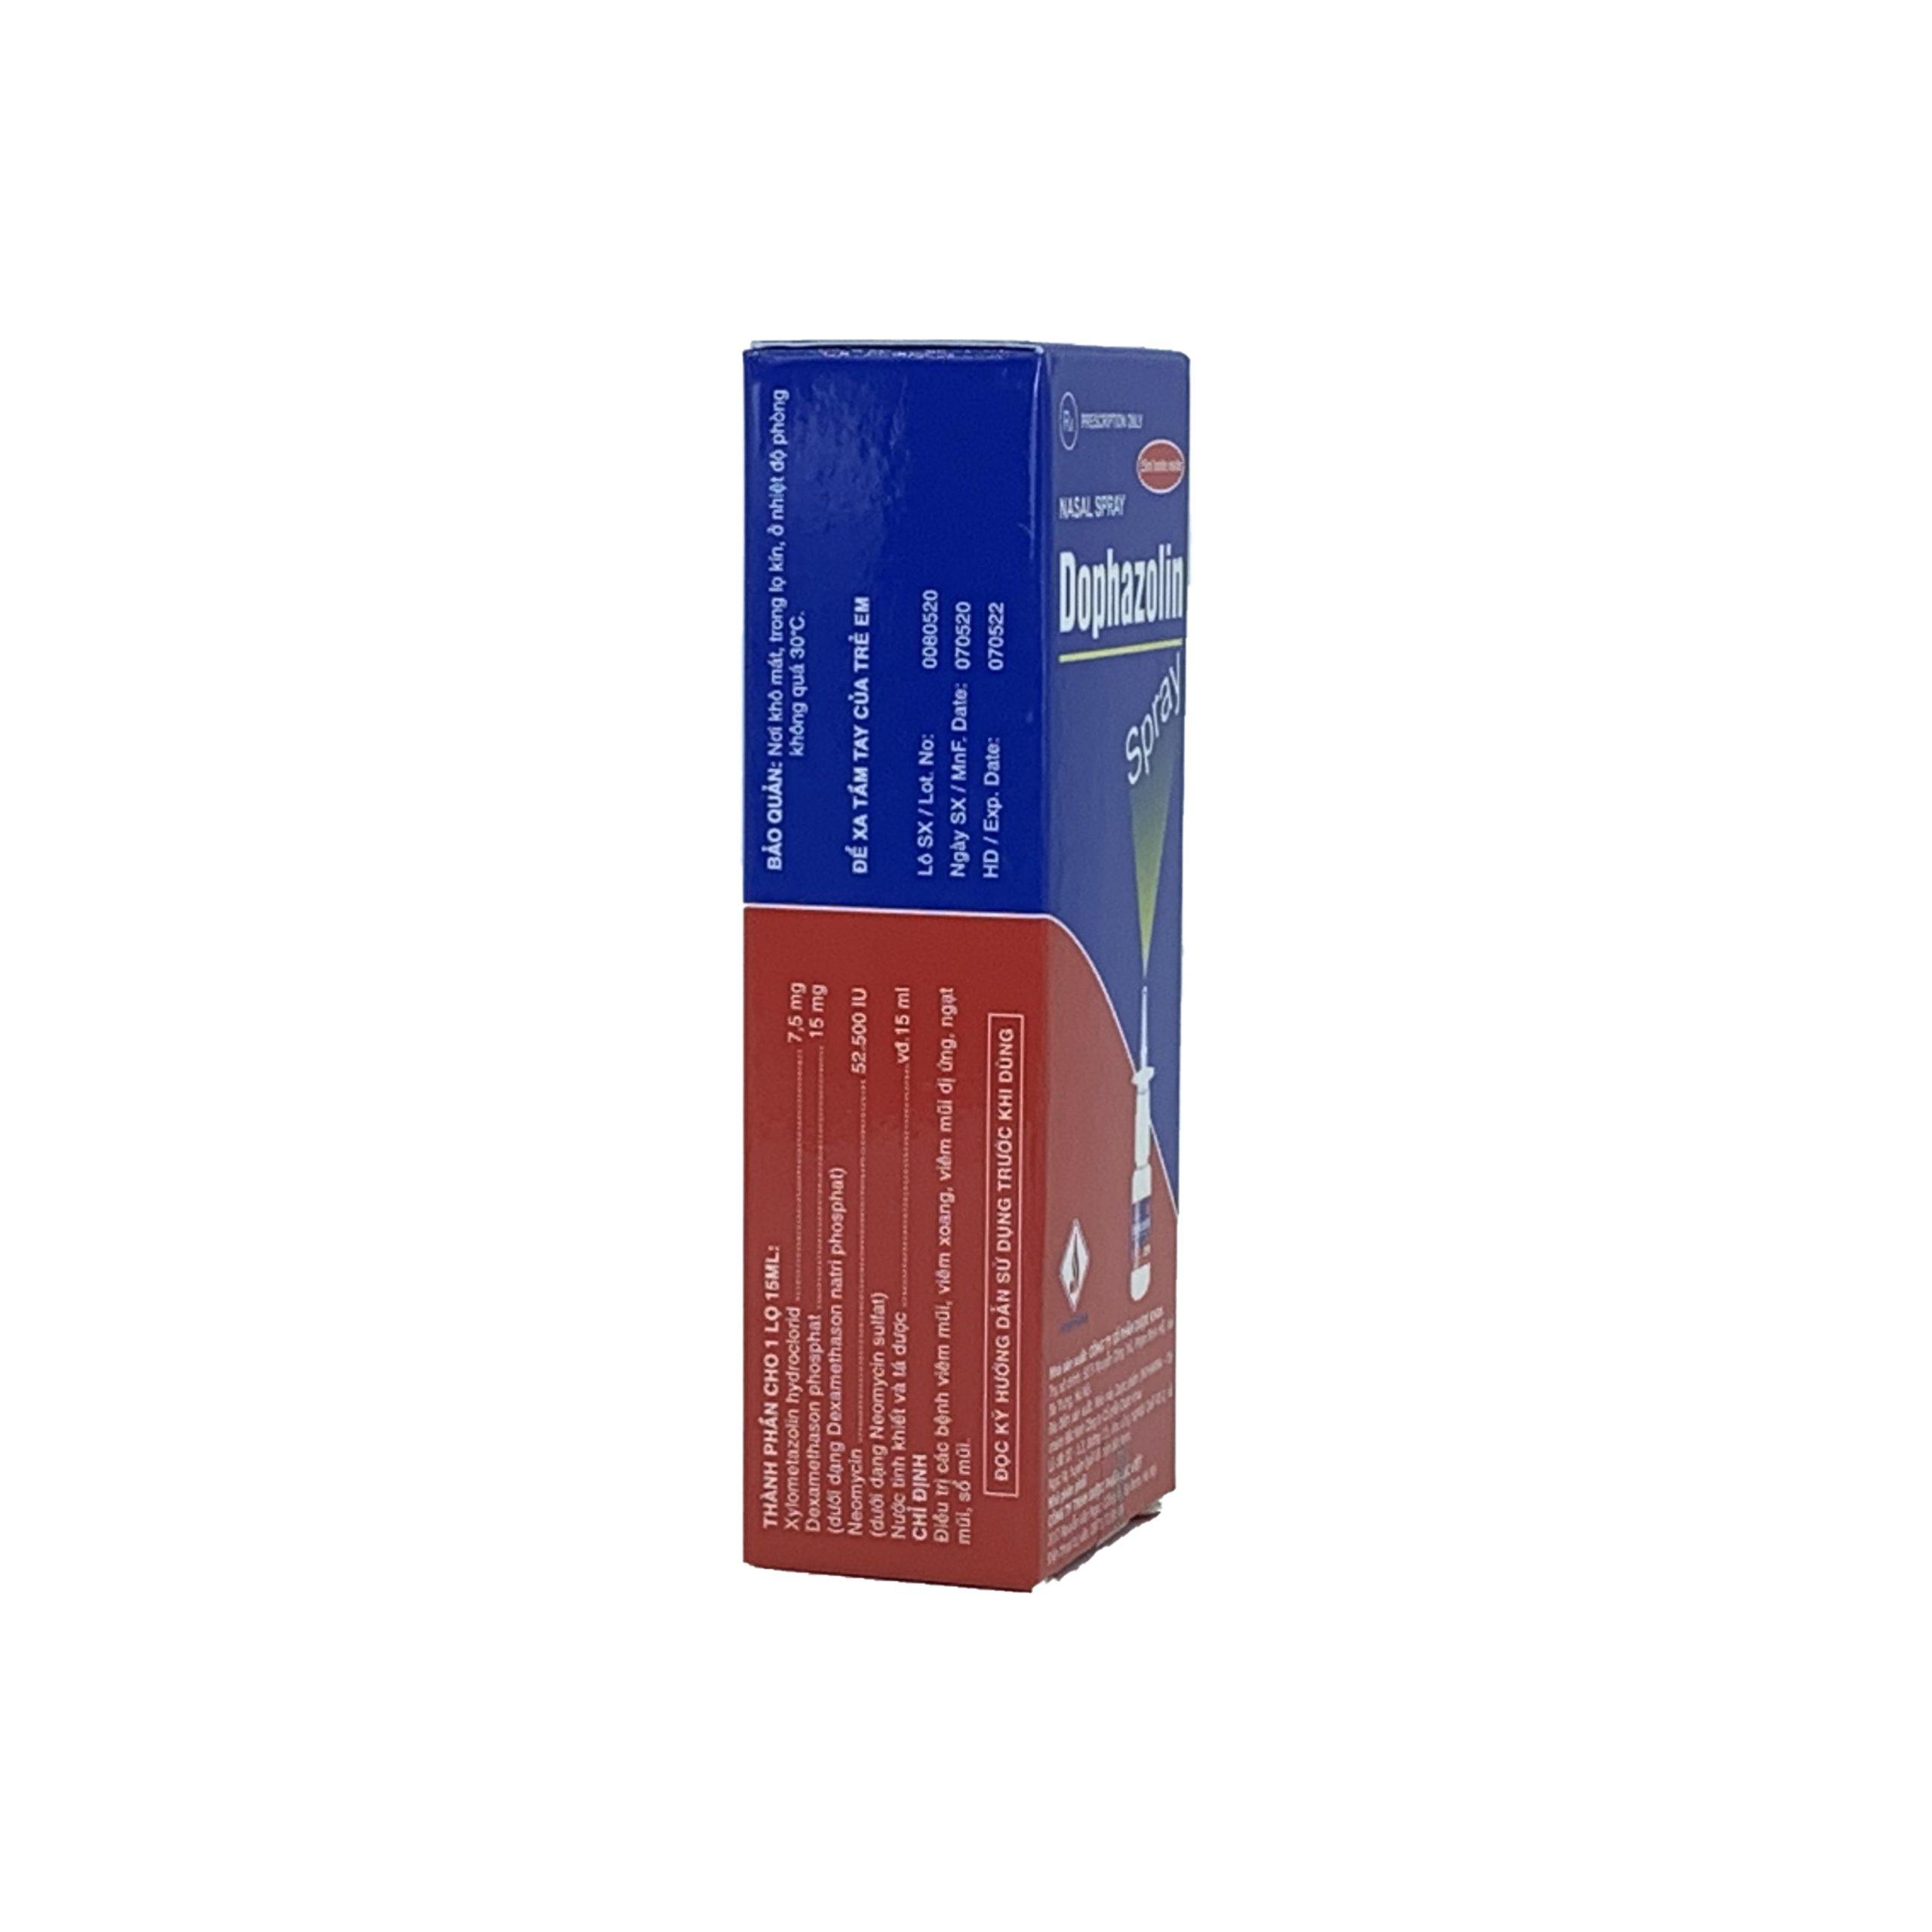 Thuốc Dophazolin Spray 15ml